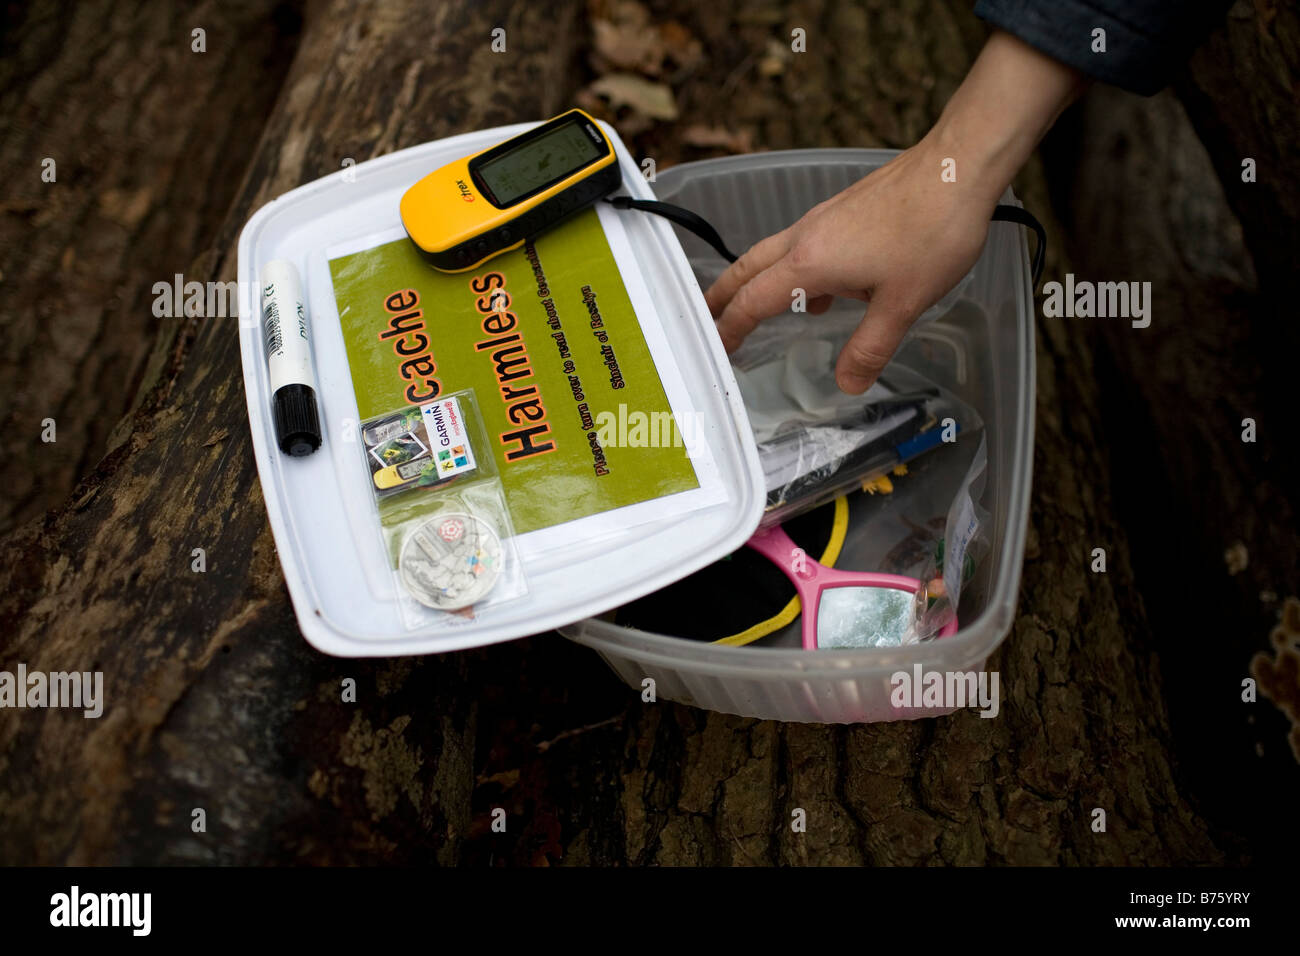 Geocache treasure box found in the countryside - Stock Image